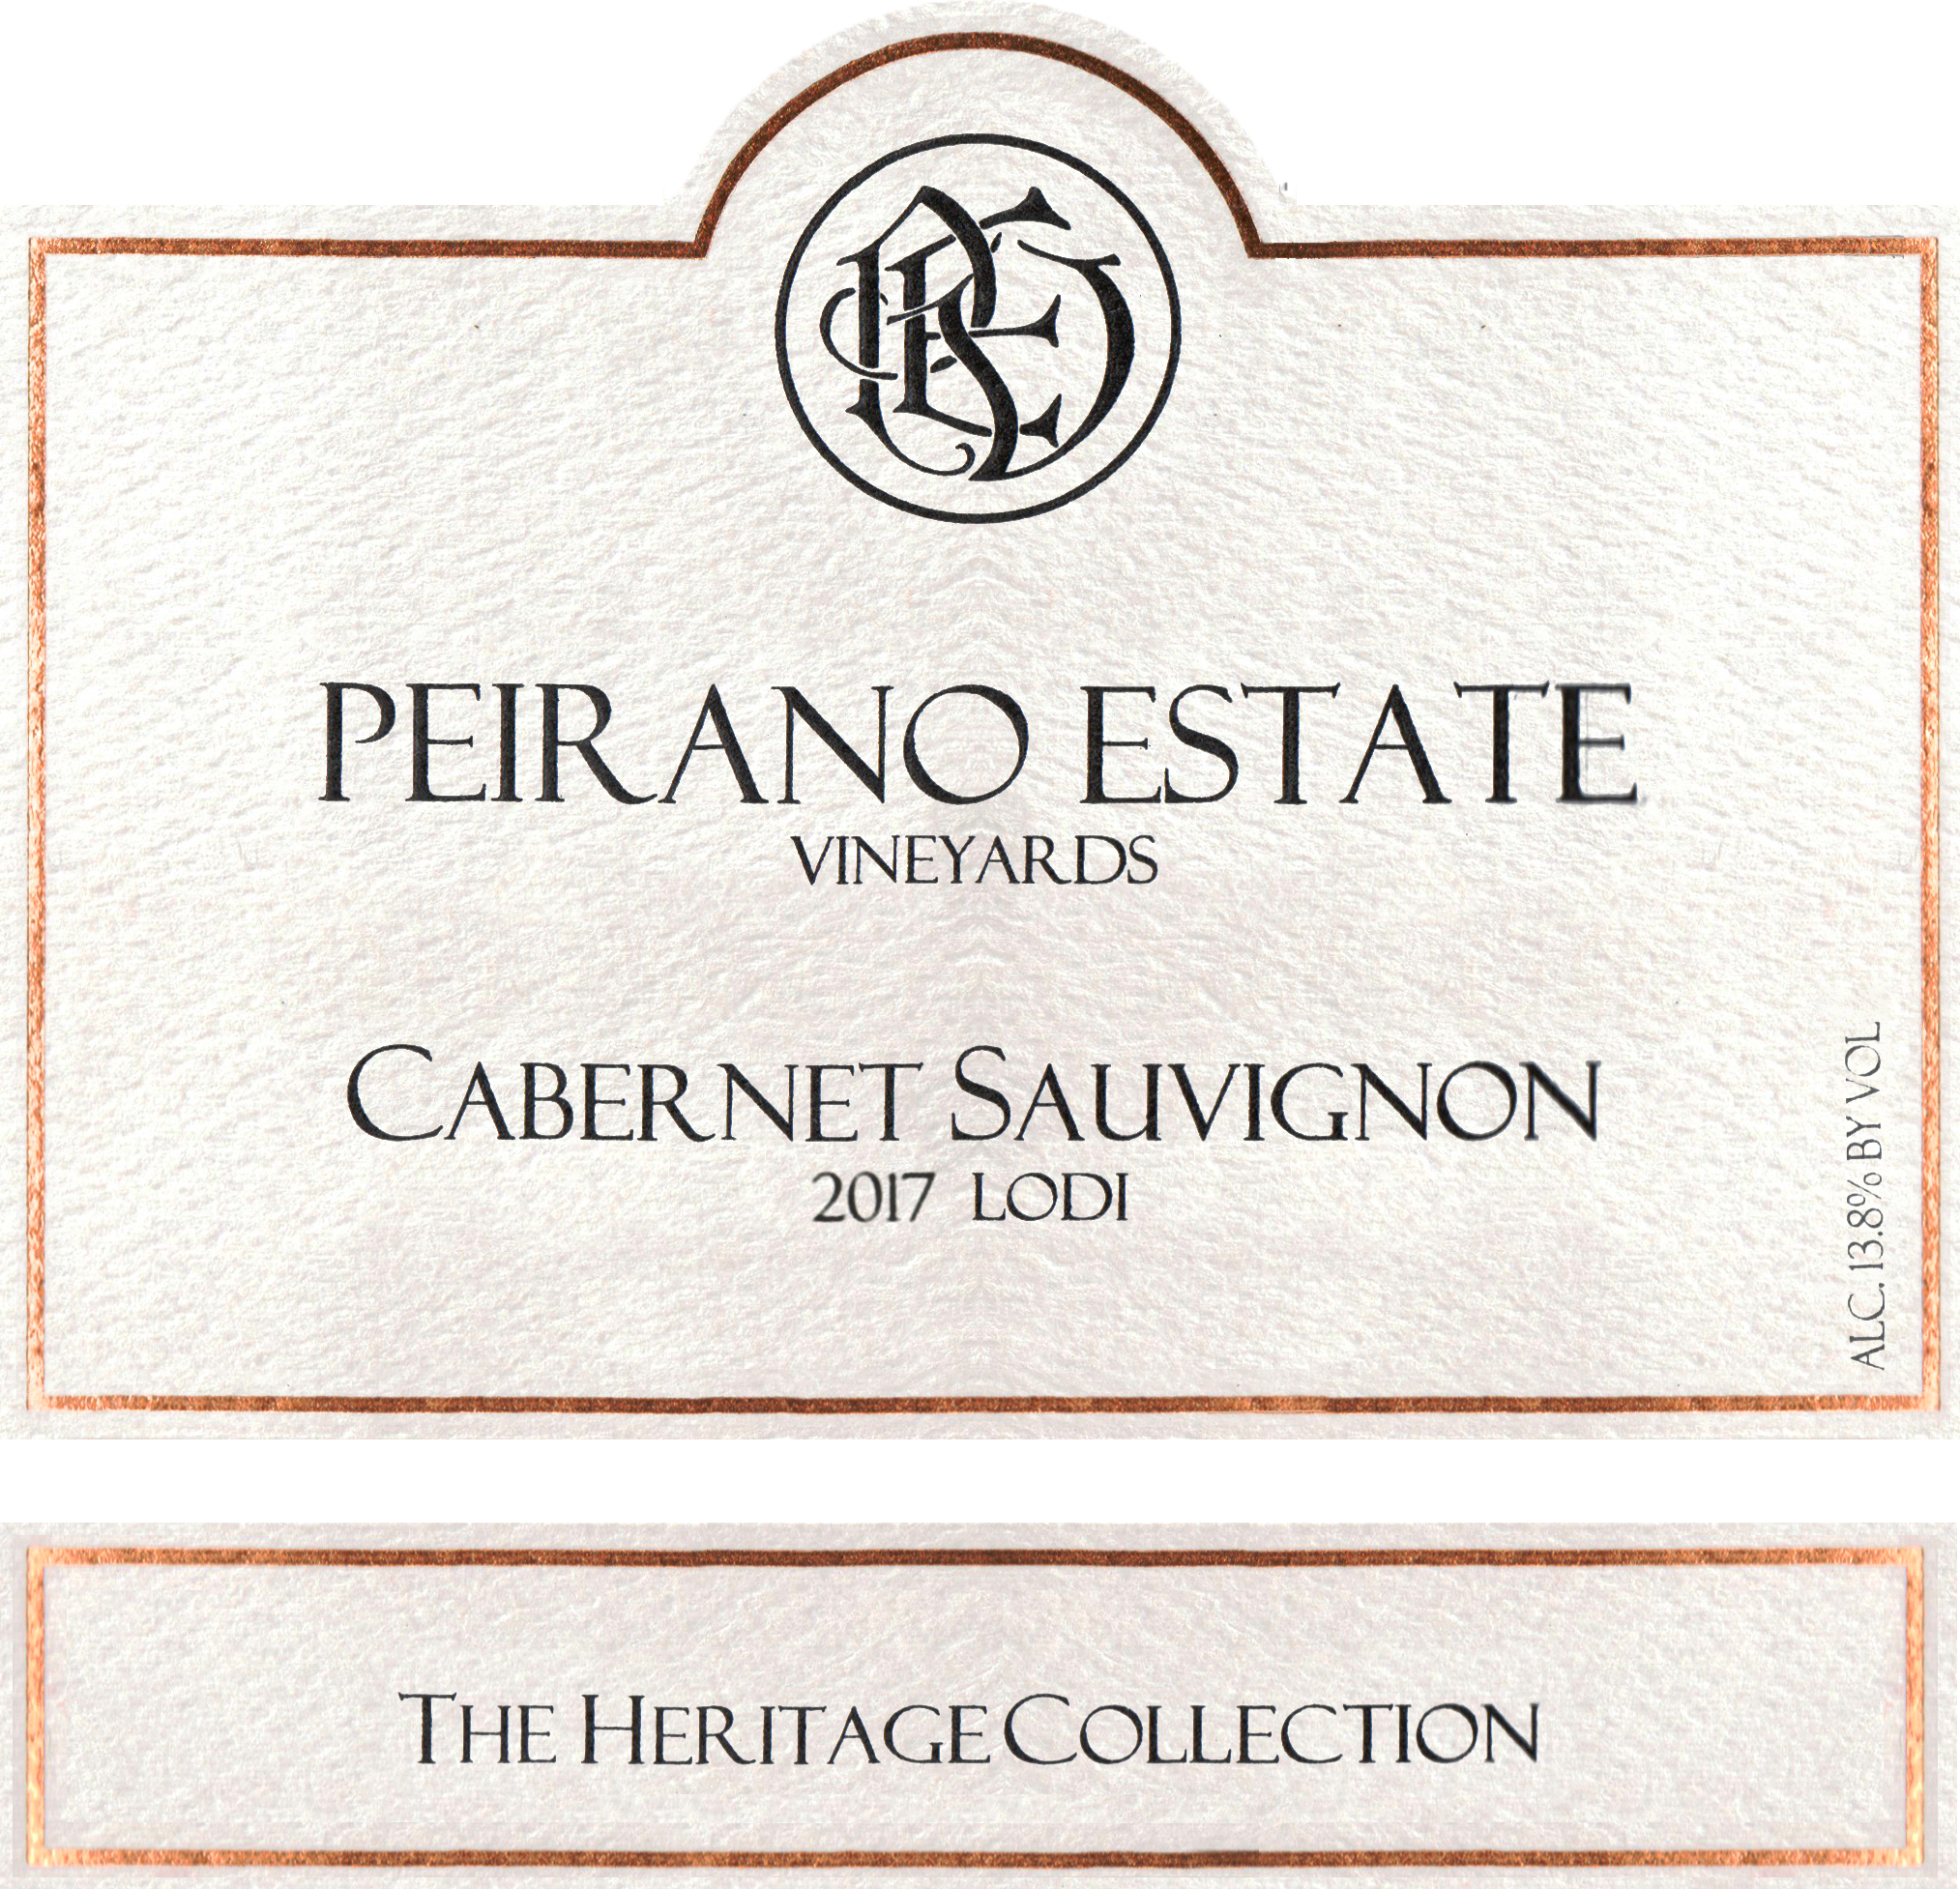 Peirano Estate Cabernet Sauvignon 2017